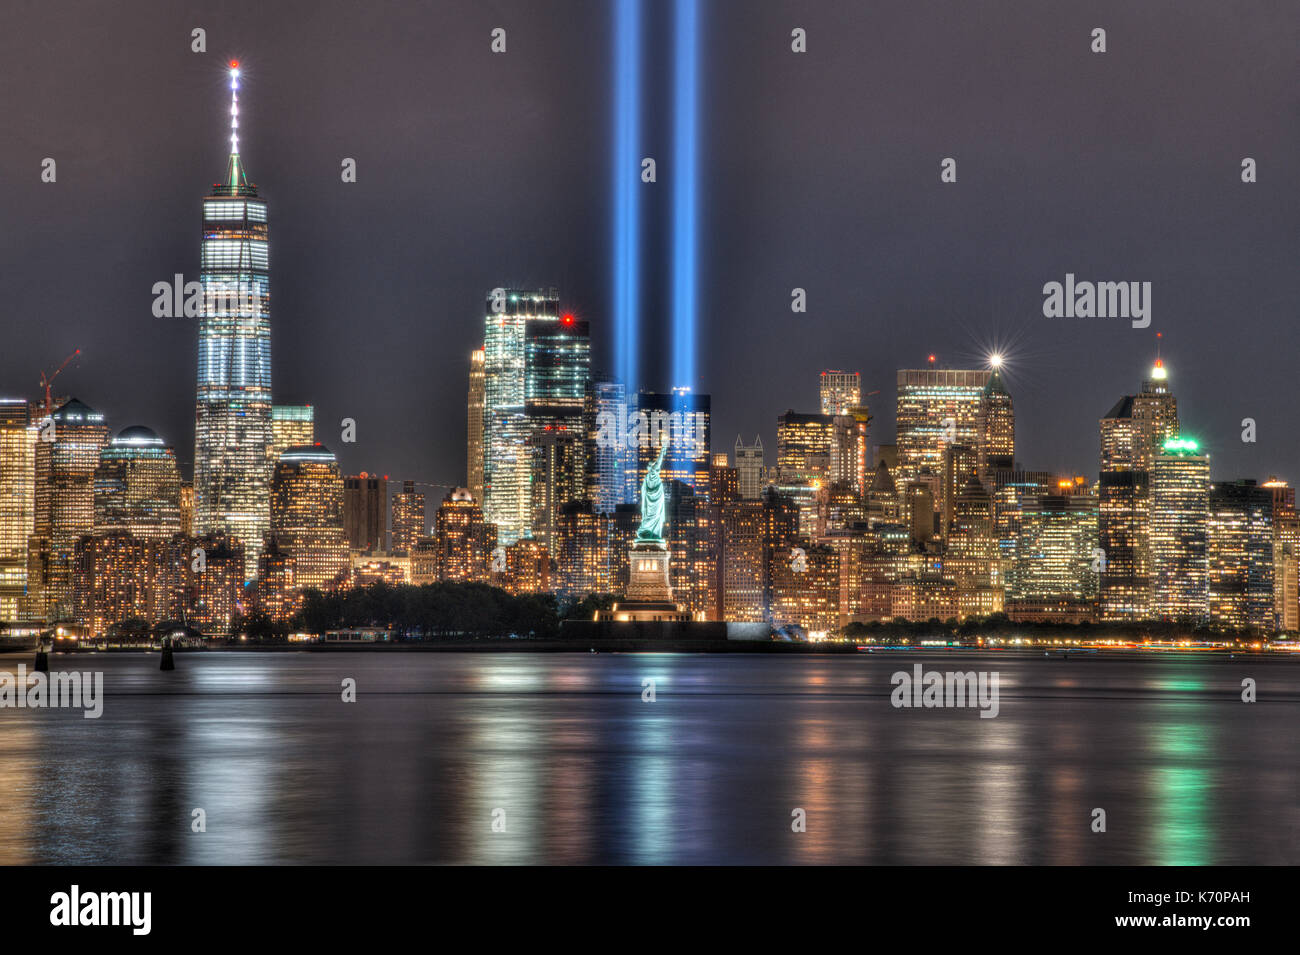 9/11 Memorial Beacons & Statue of Liberty - Stock Image